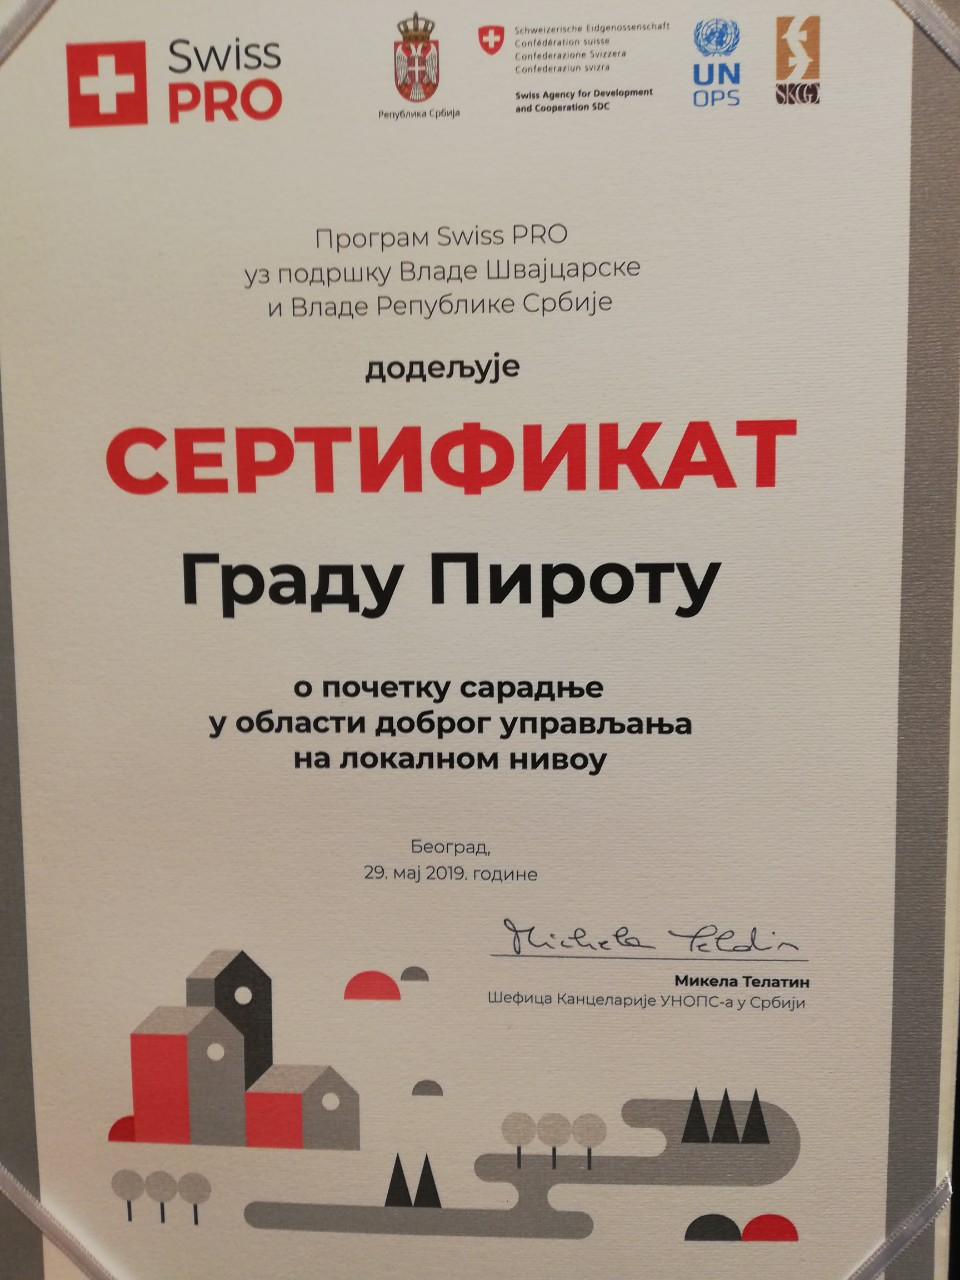 Photo of I Grad Pirot potpisnik Memoranduma o razumevanju sa programom Swiss PRO